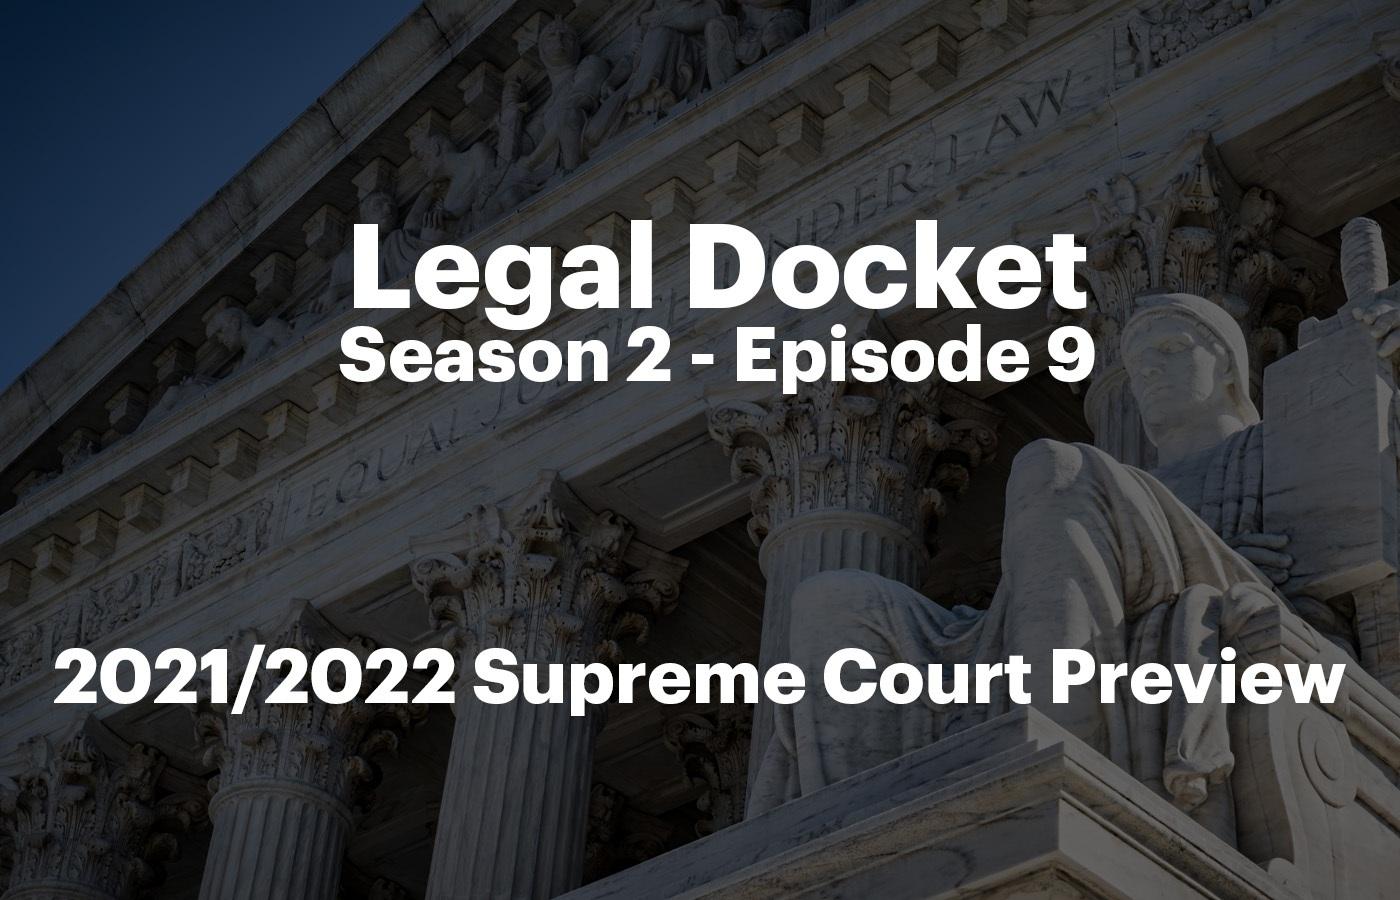 Legal Docket S2 E9